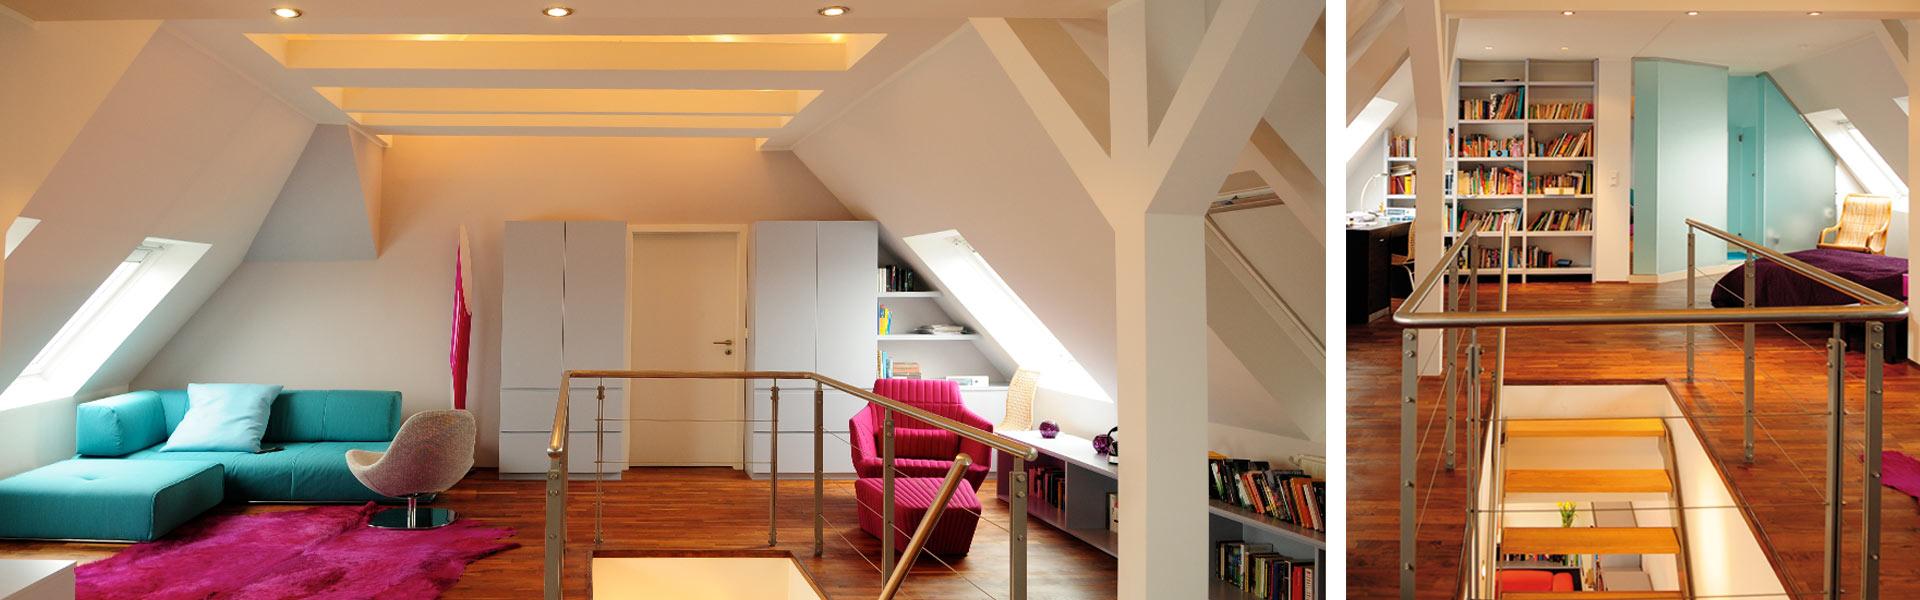 Genius Loci Baukultur Projekt Loft Architektur Innenarchitektur Düsseldorf